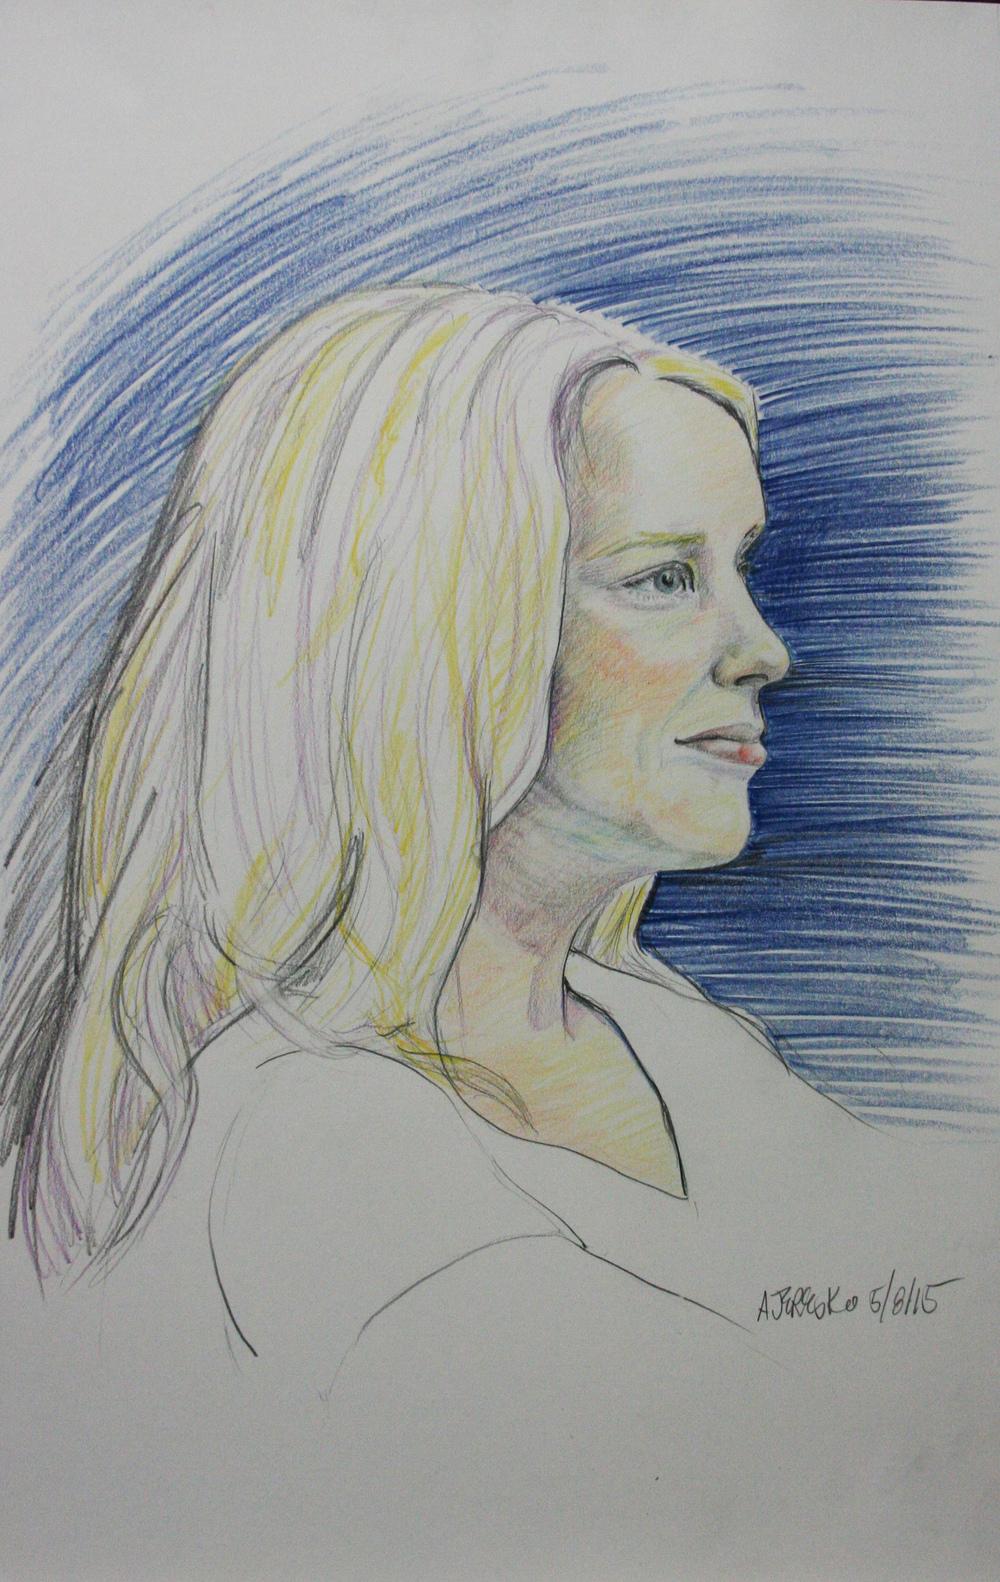 Alice Jeresko did this 2-hour drawing.